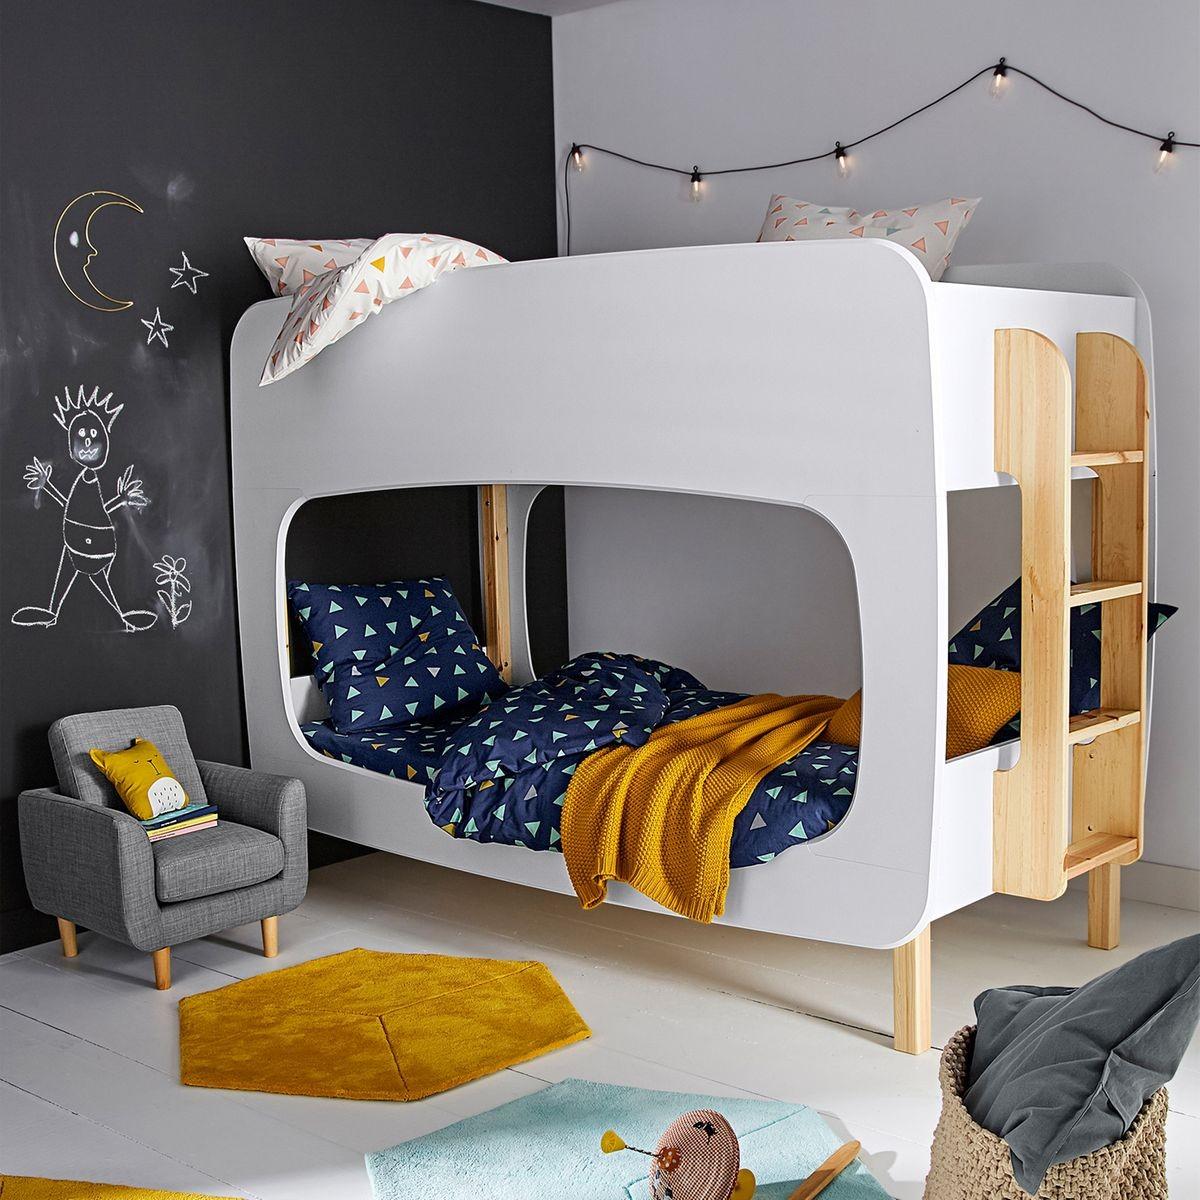 la redoute lits superpos s hollandschewind. Black Bedroom Furniture Sets. Home Design Ideas